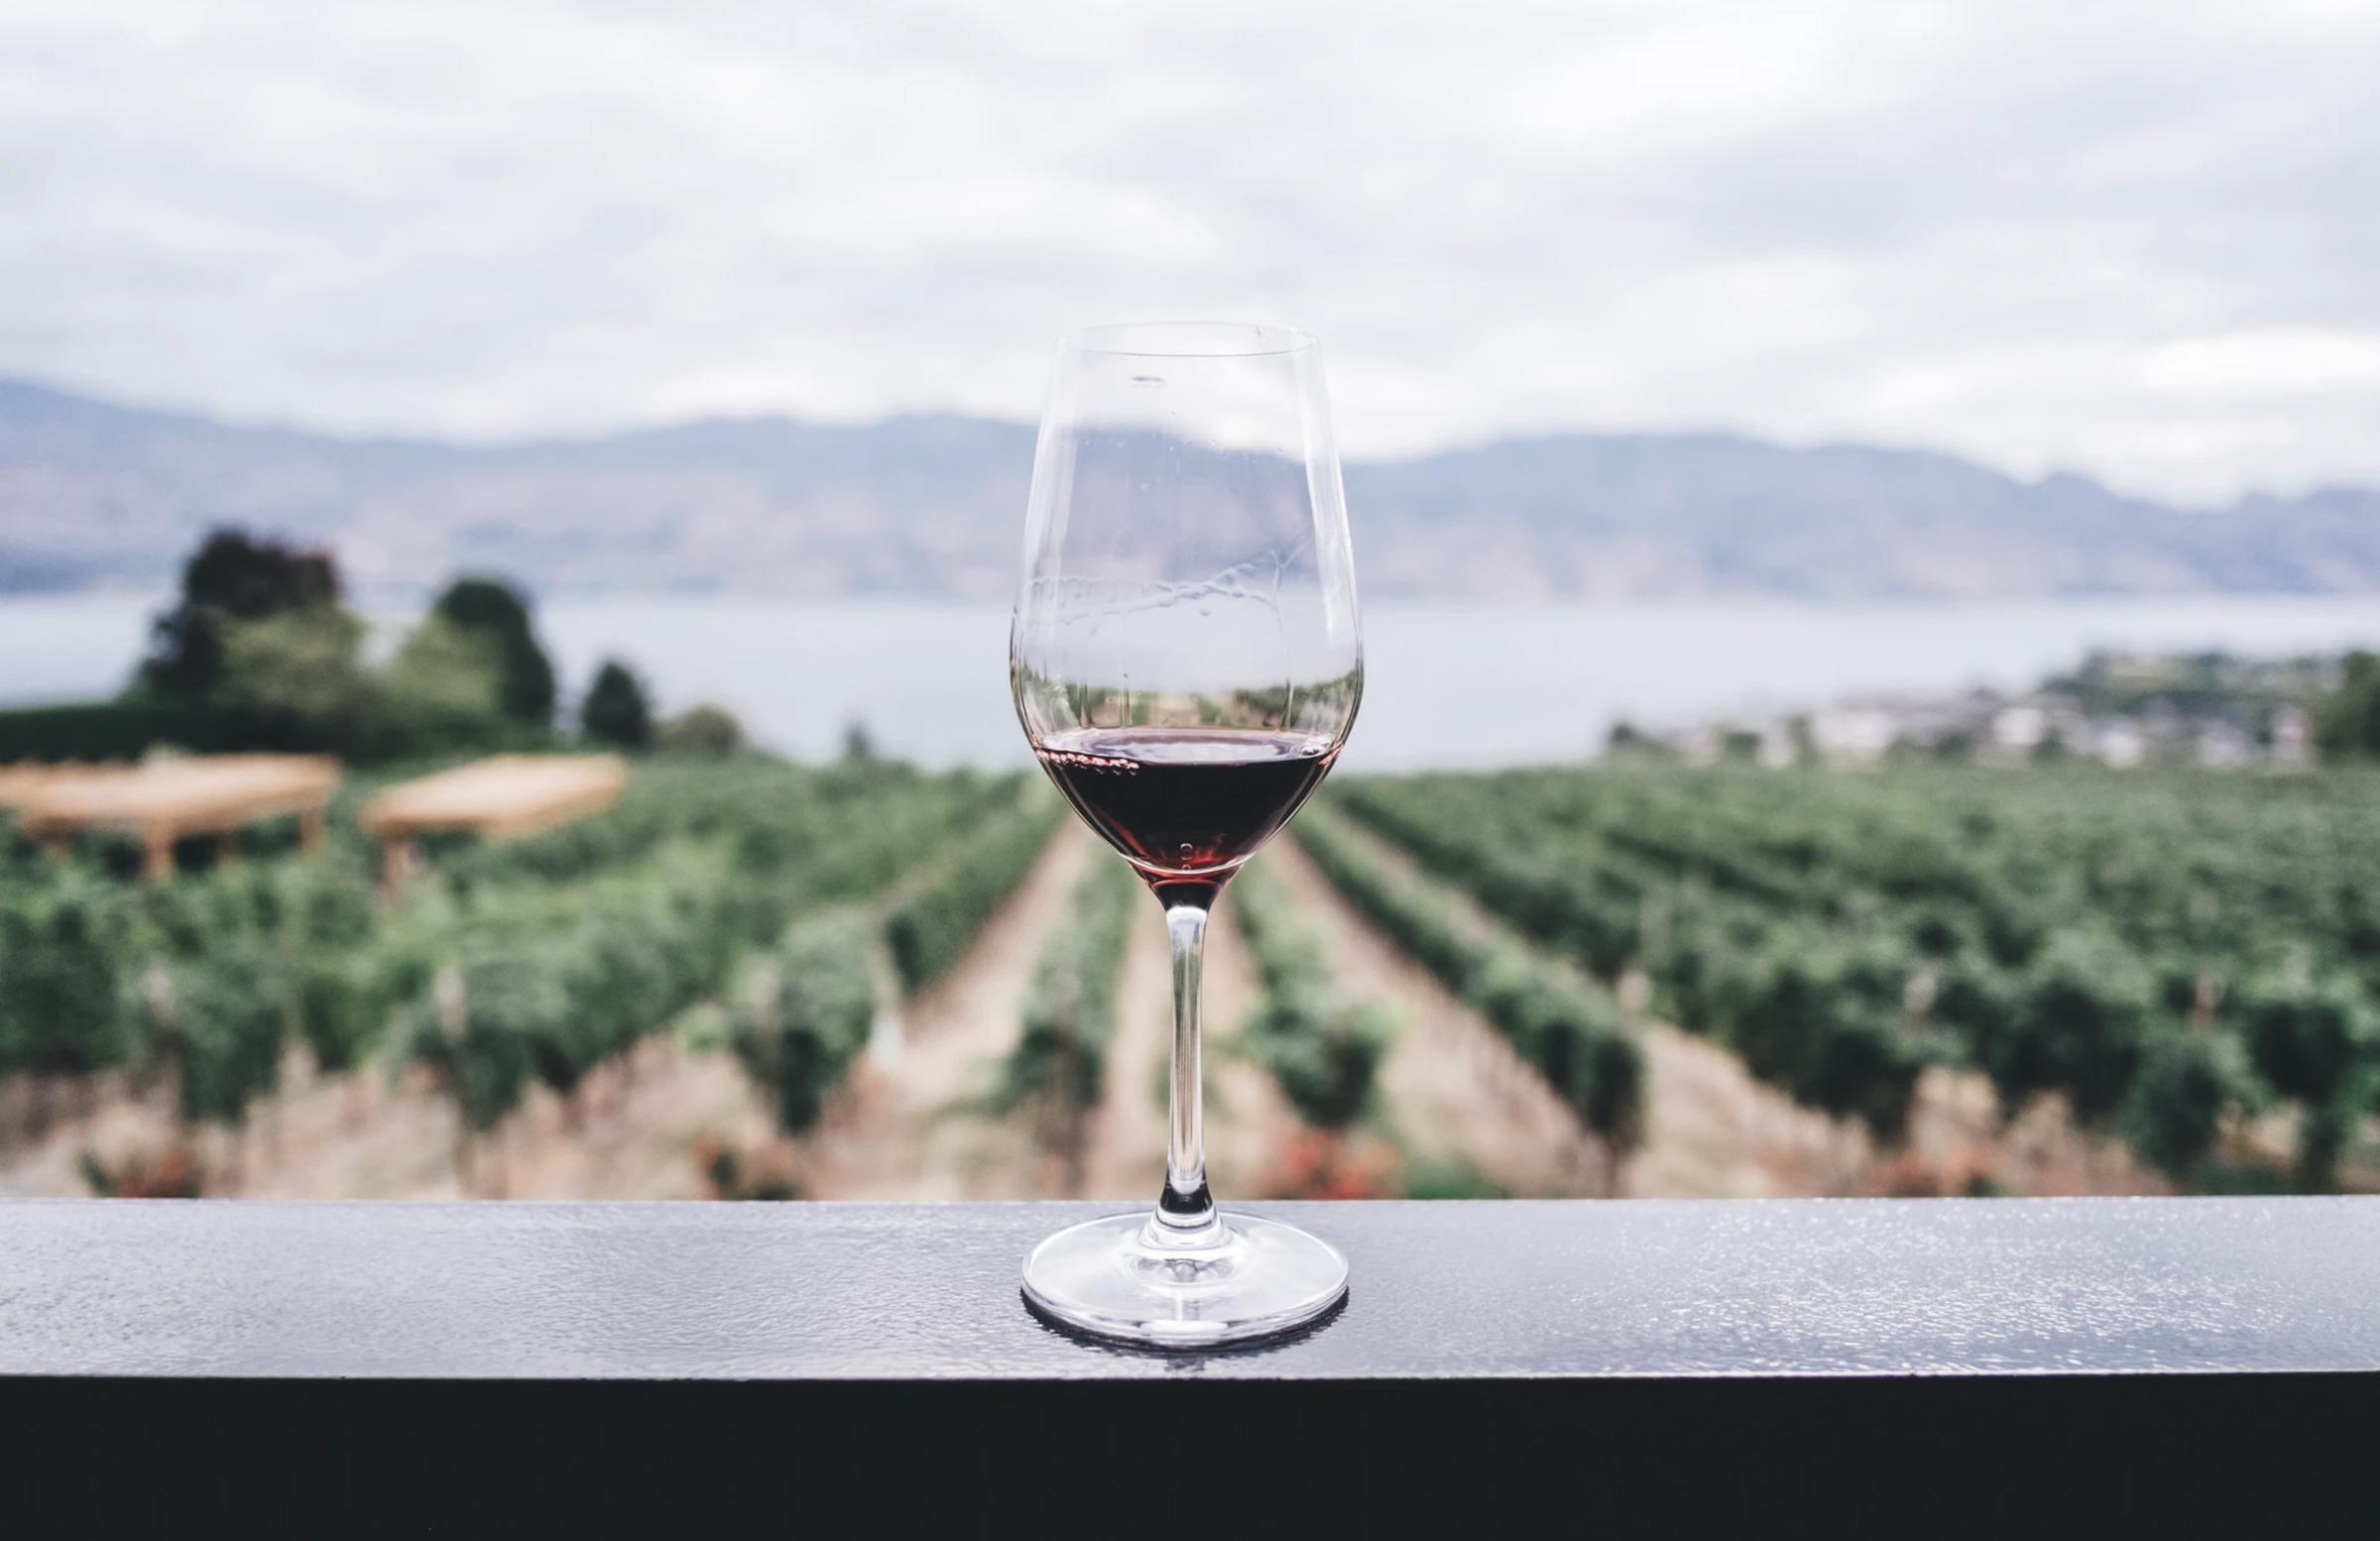 https://a.storyblok.com/f/105614/8070x5224/a80b5b2ae0/ward-wines_022.jpg